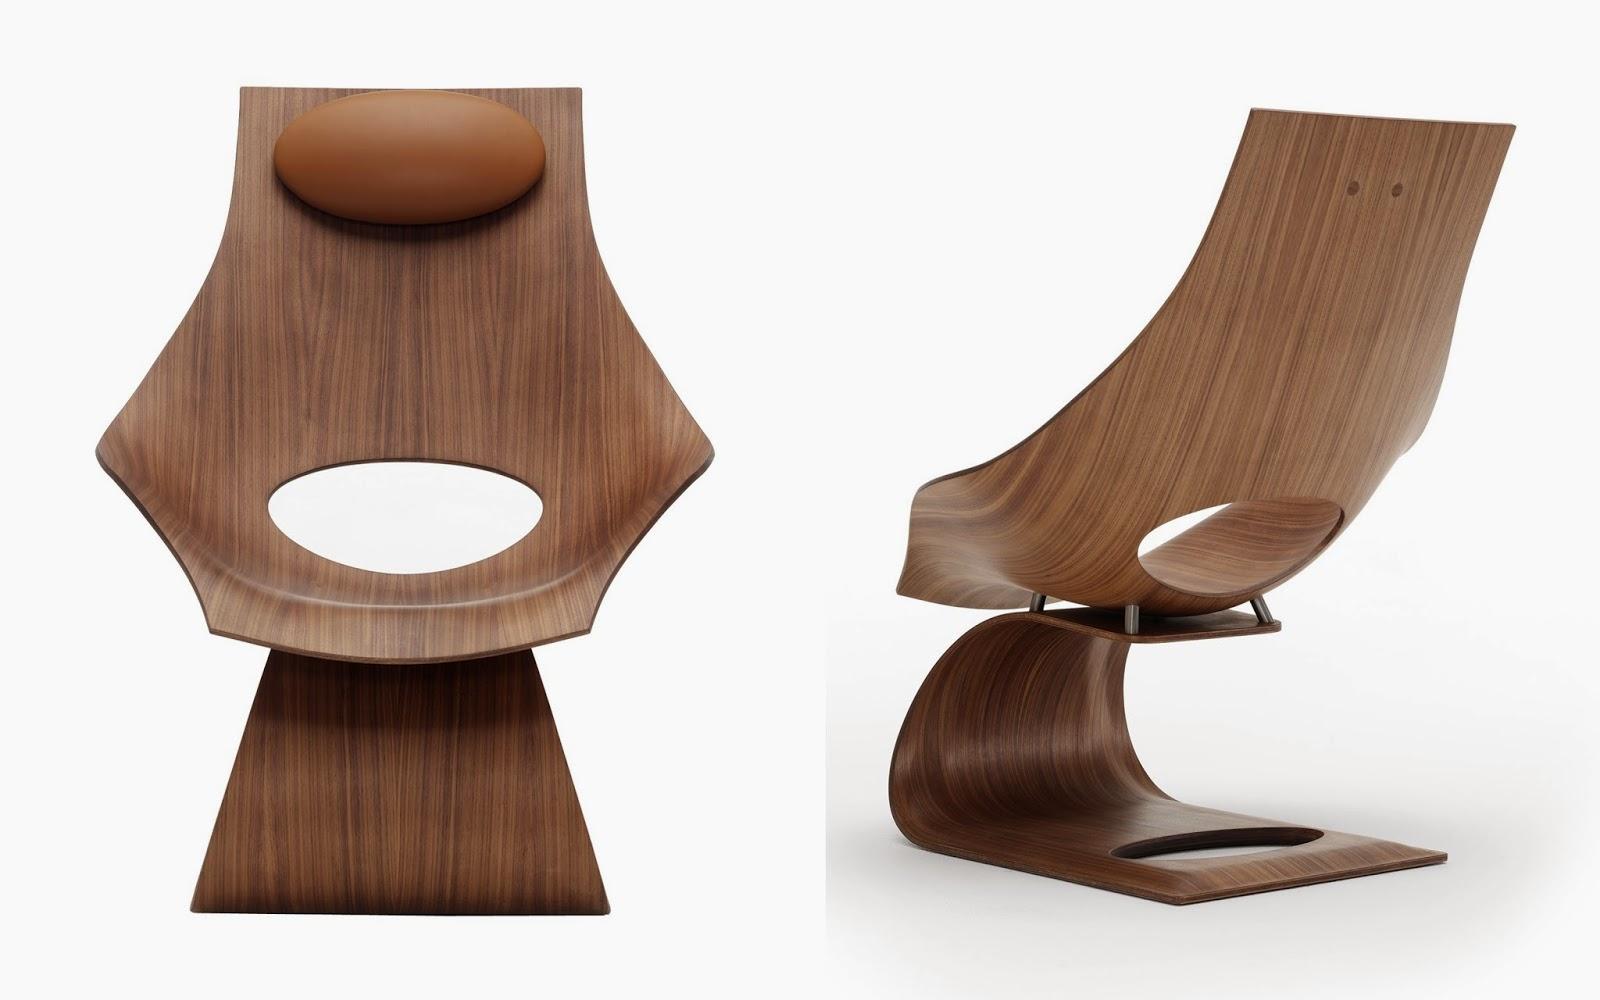 Darya girina interior design march 2015 - J Nis Straupe Ommode